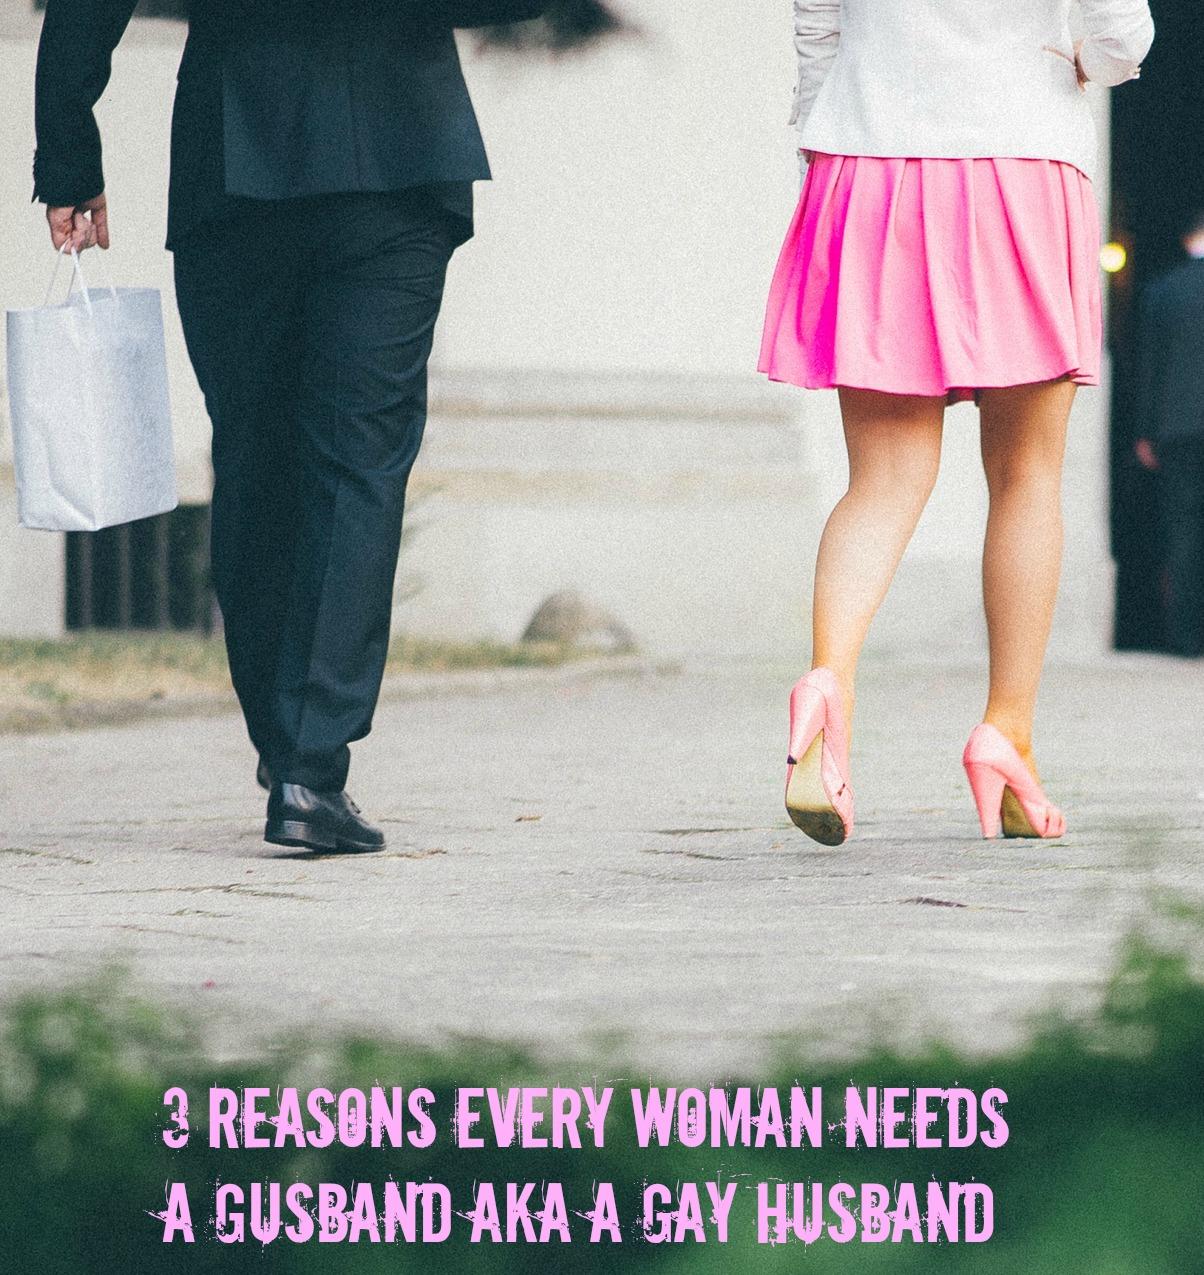 3 Reasons Every Woman Needs a Gusband aka a Gay Husband